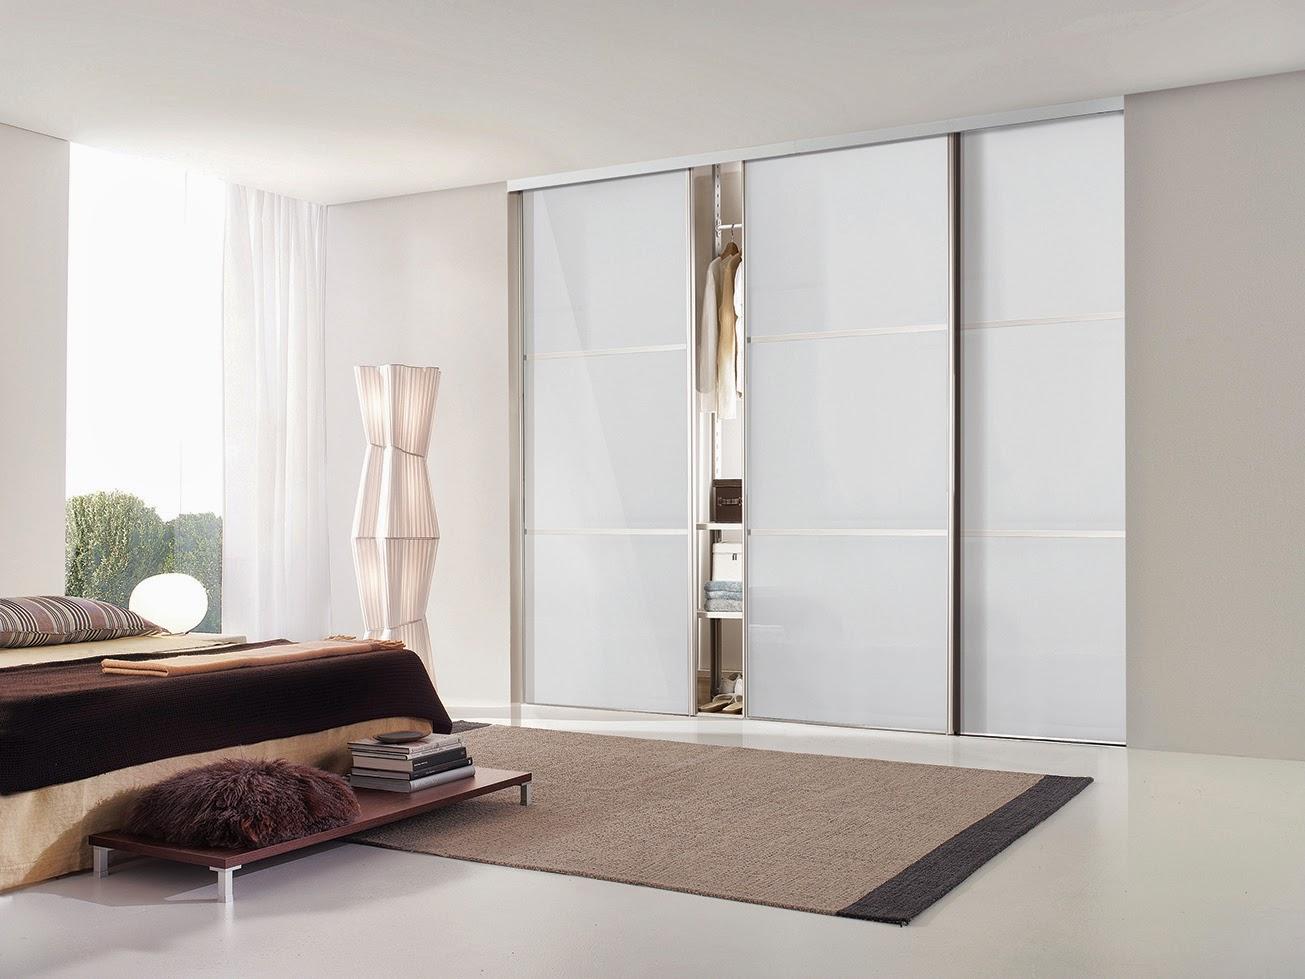 bedrooms plus sliding wardrobe doors and fittings replacing sliding wardrobe doors wheels tops. Black Bedroom Furniture Sets. Home Design Ideas